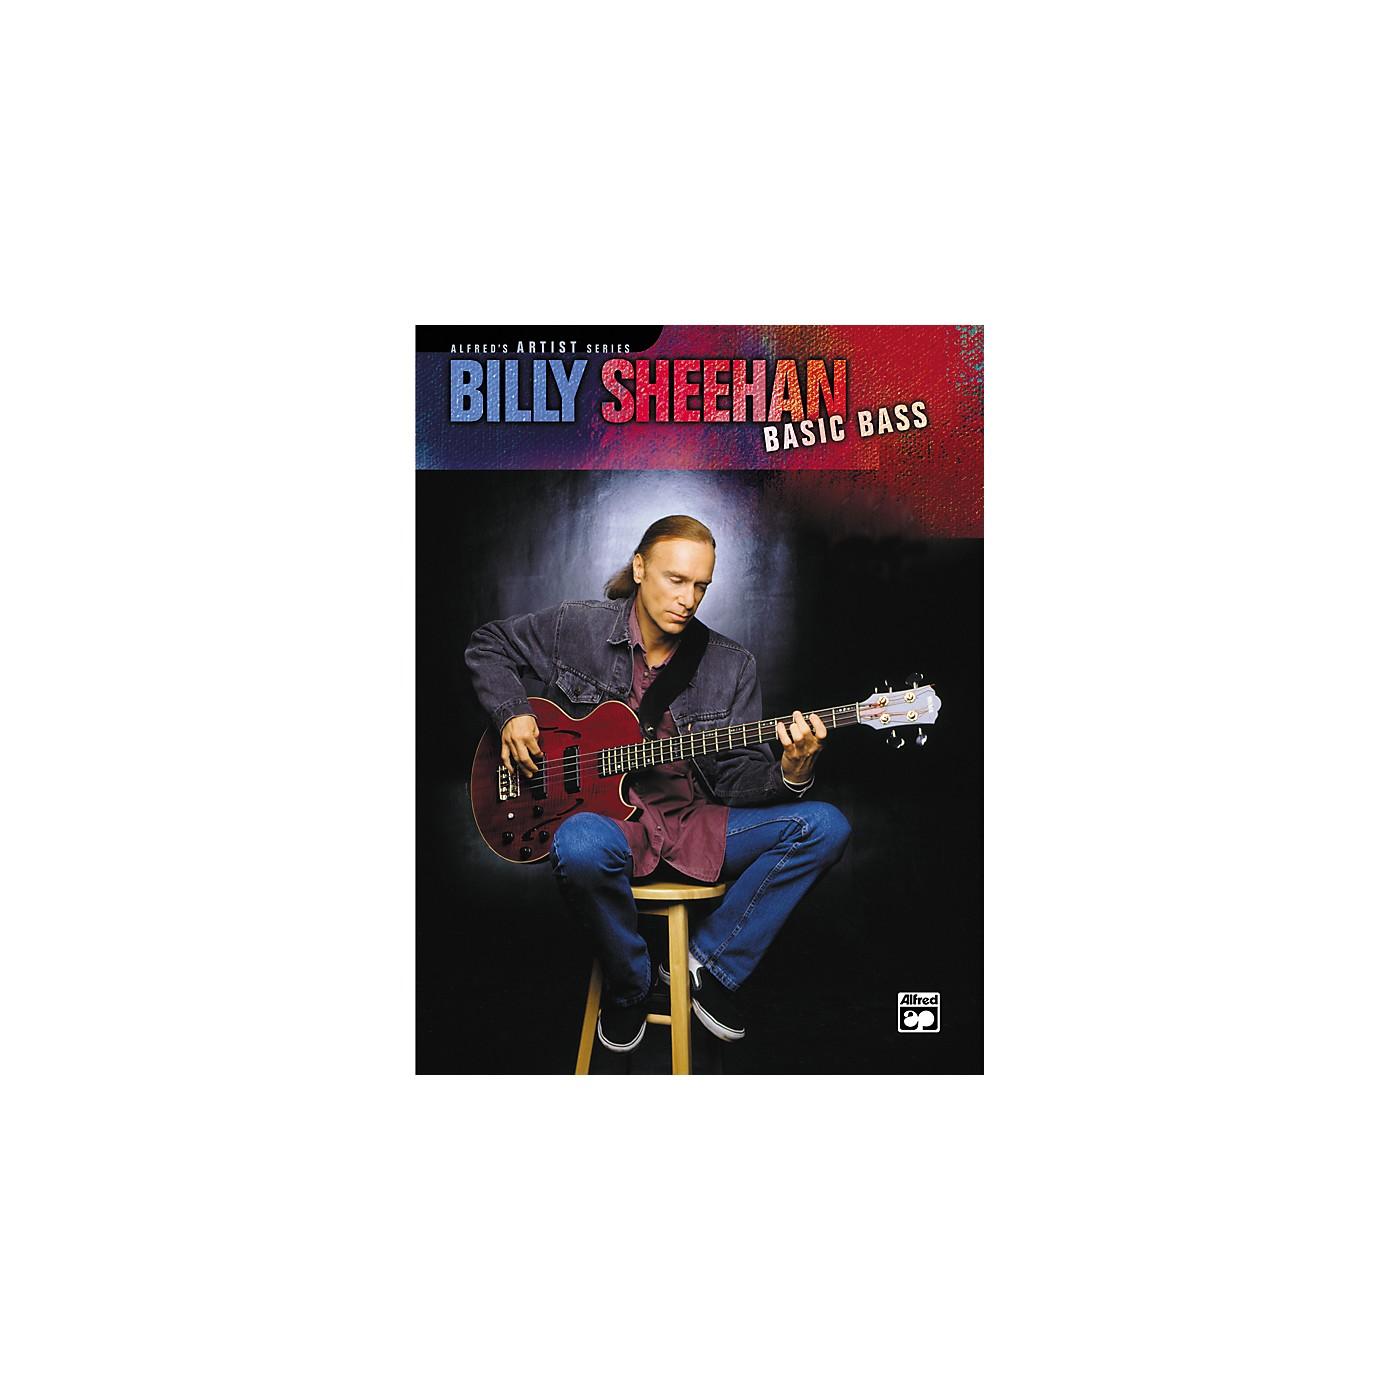 Alfred Billy Sheehan: Basic Bass Book thumbnail